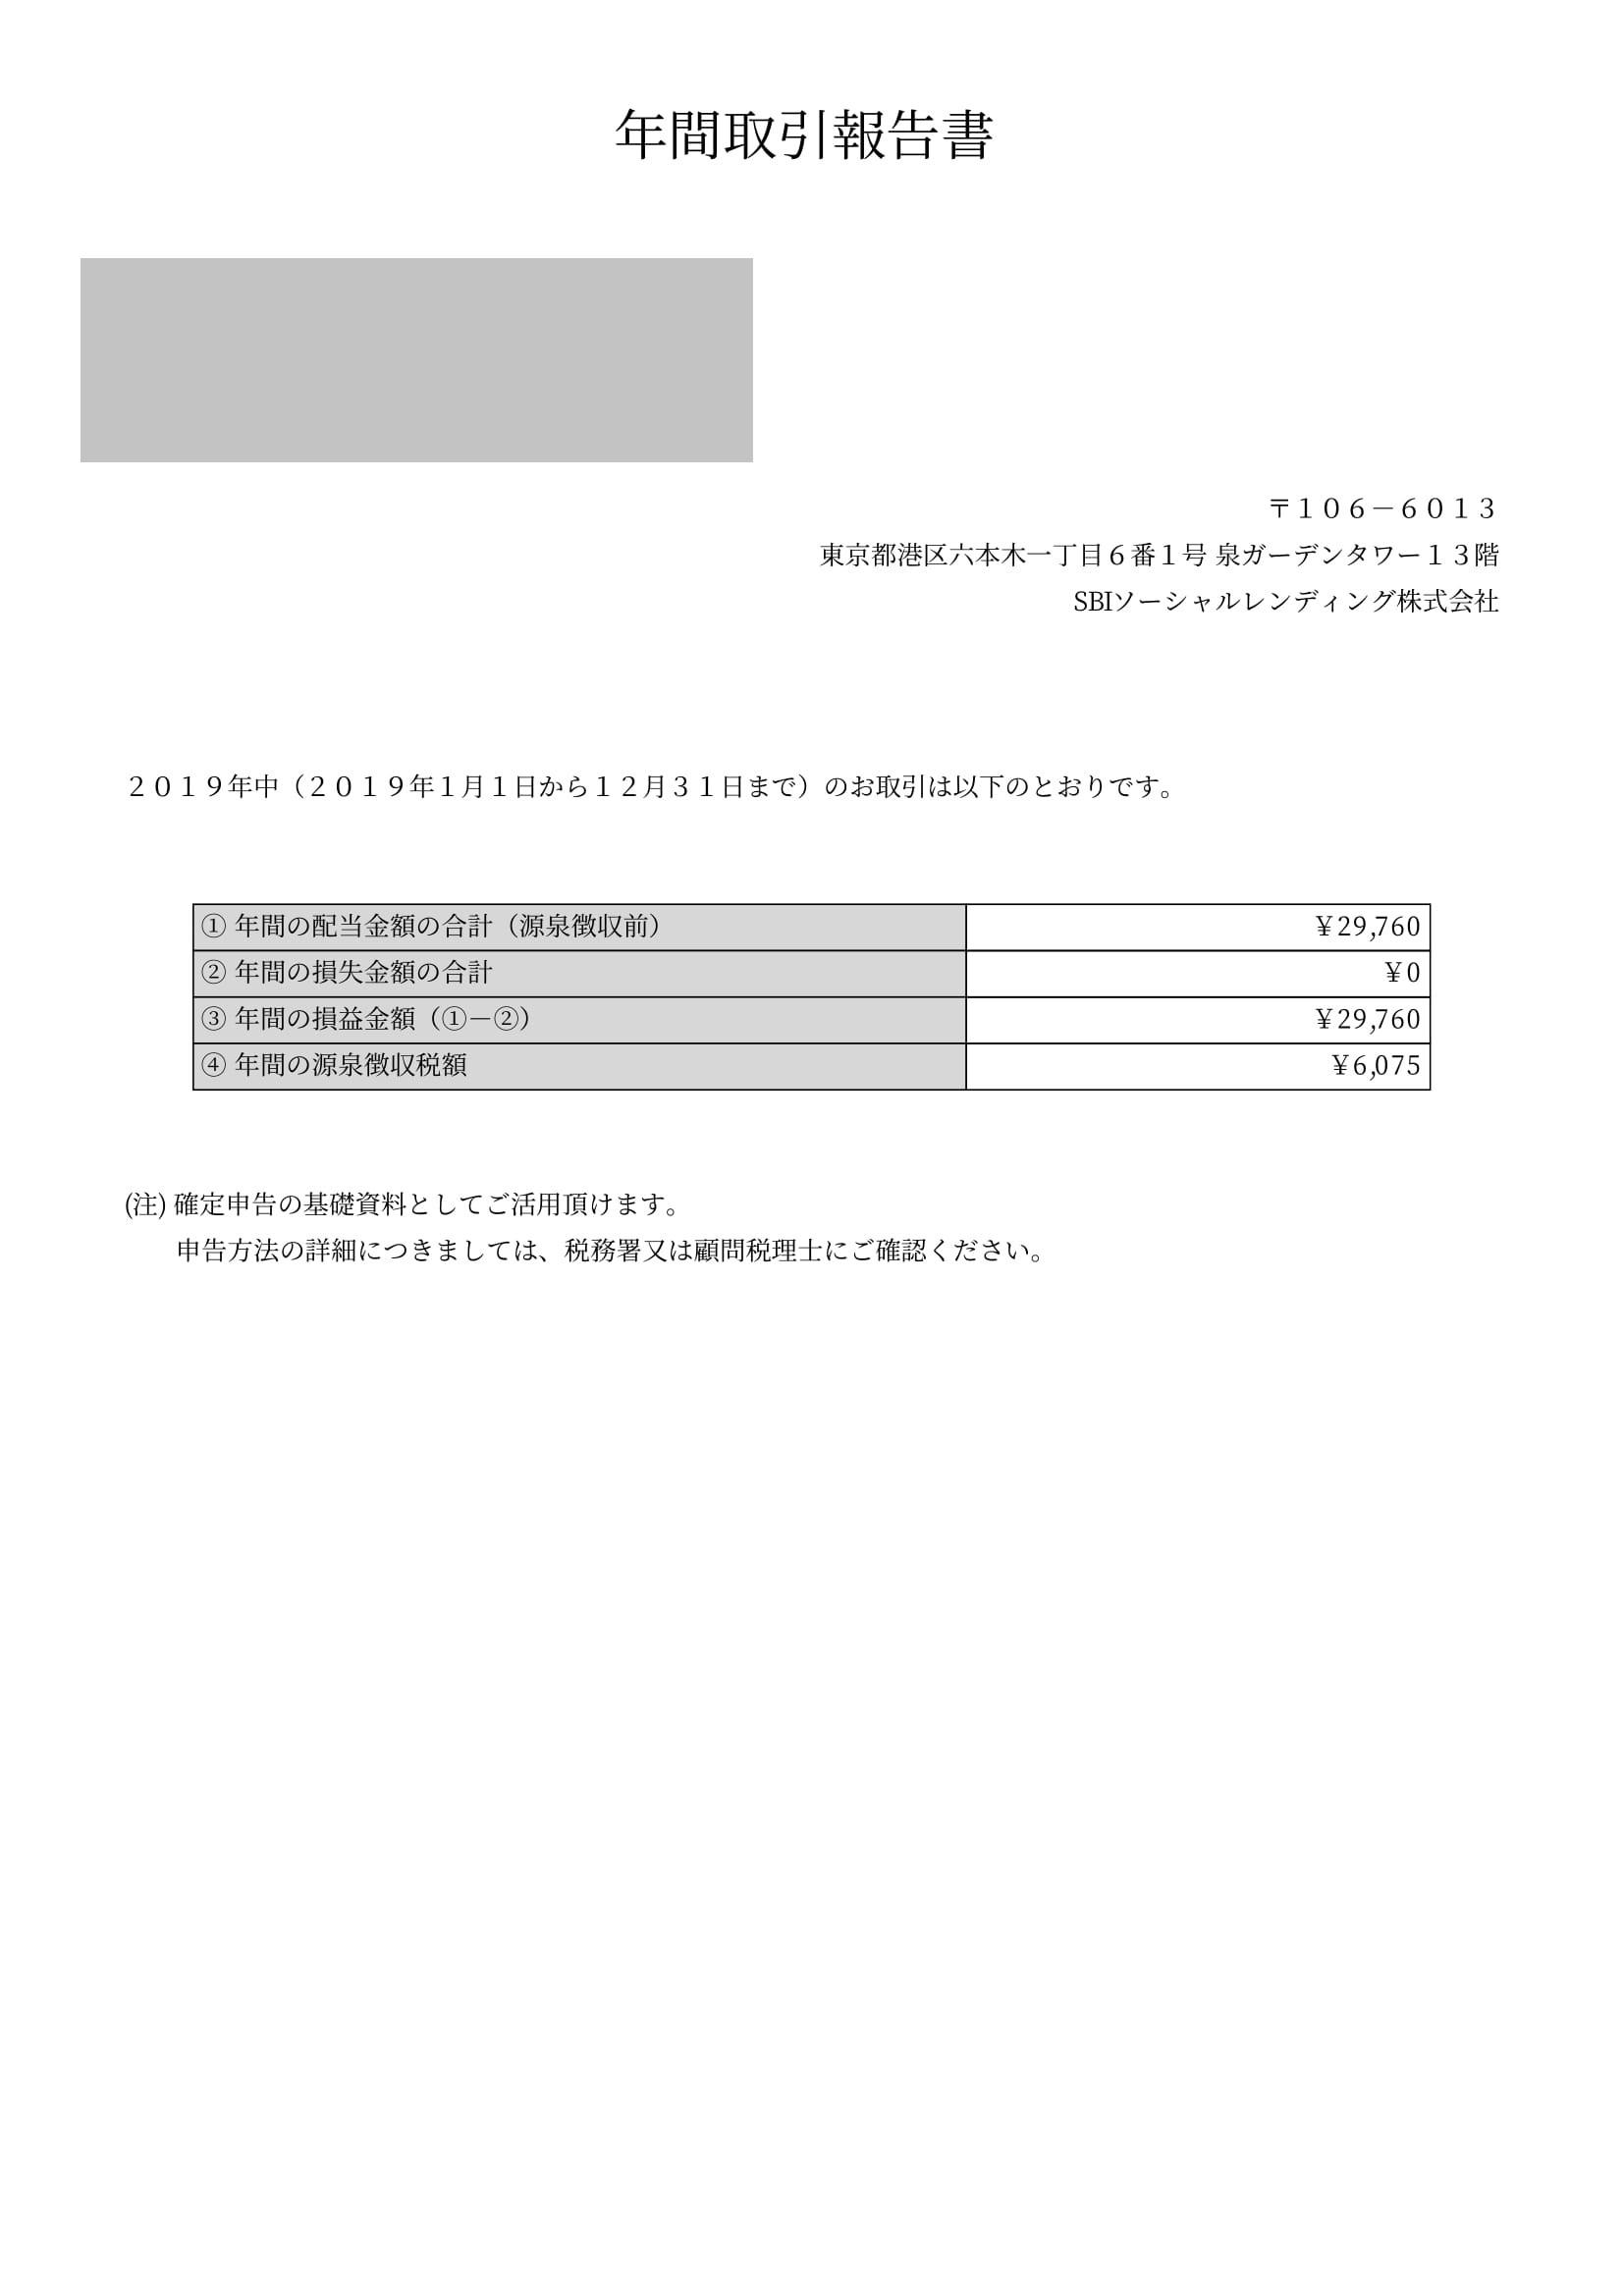 SBI年間取引報告書 (3)-1